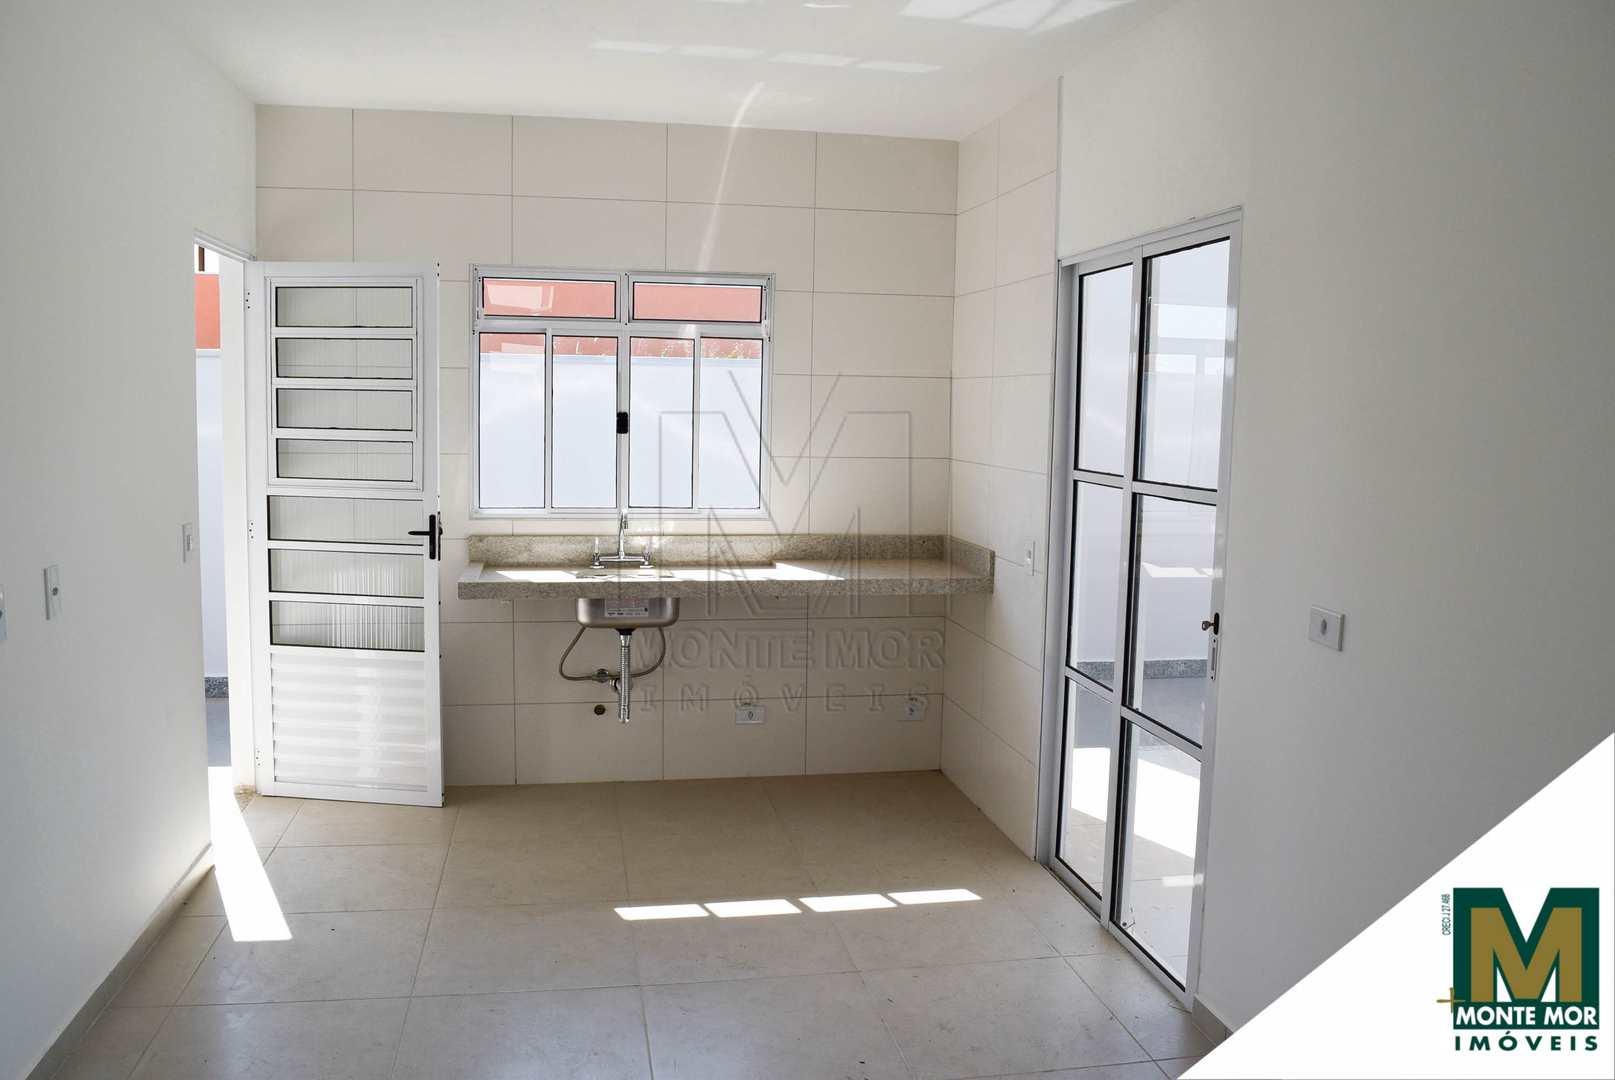 Casa com 03 suítes -  Condomínio Monte Verde - Monte Mor